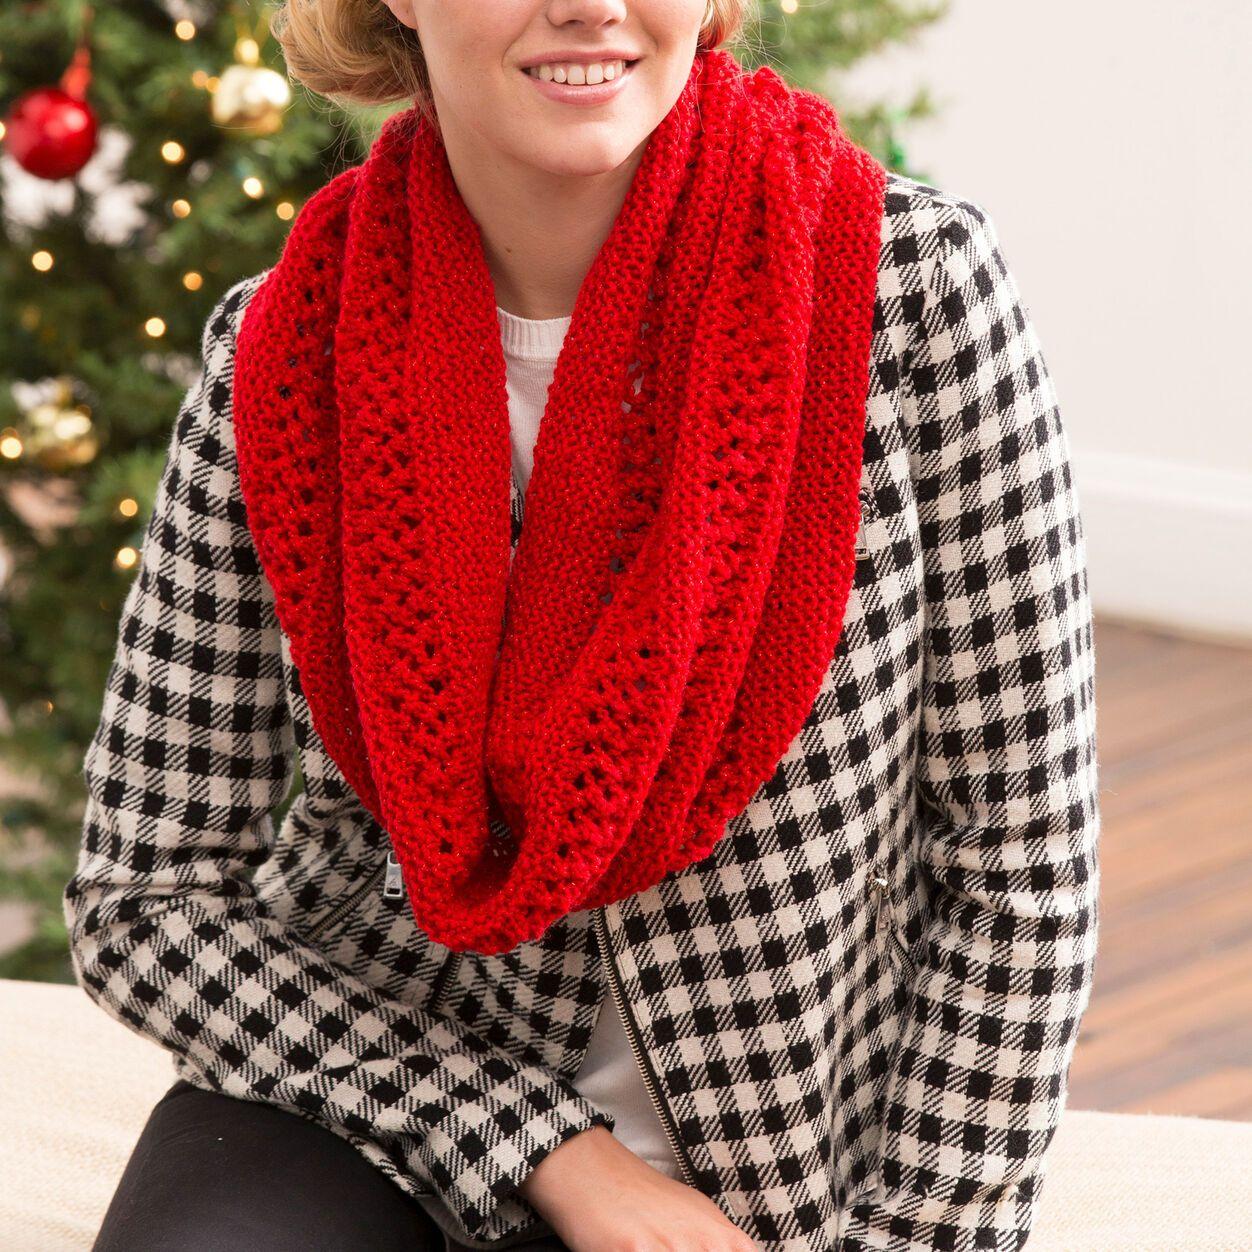 Red Heart Christmas Cowl | Yarnspirations | Infinity scarf ...